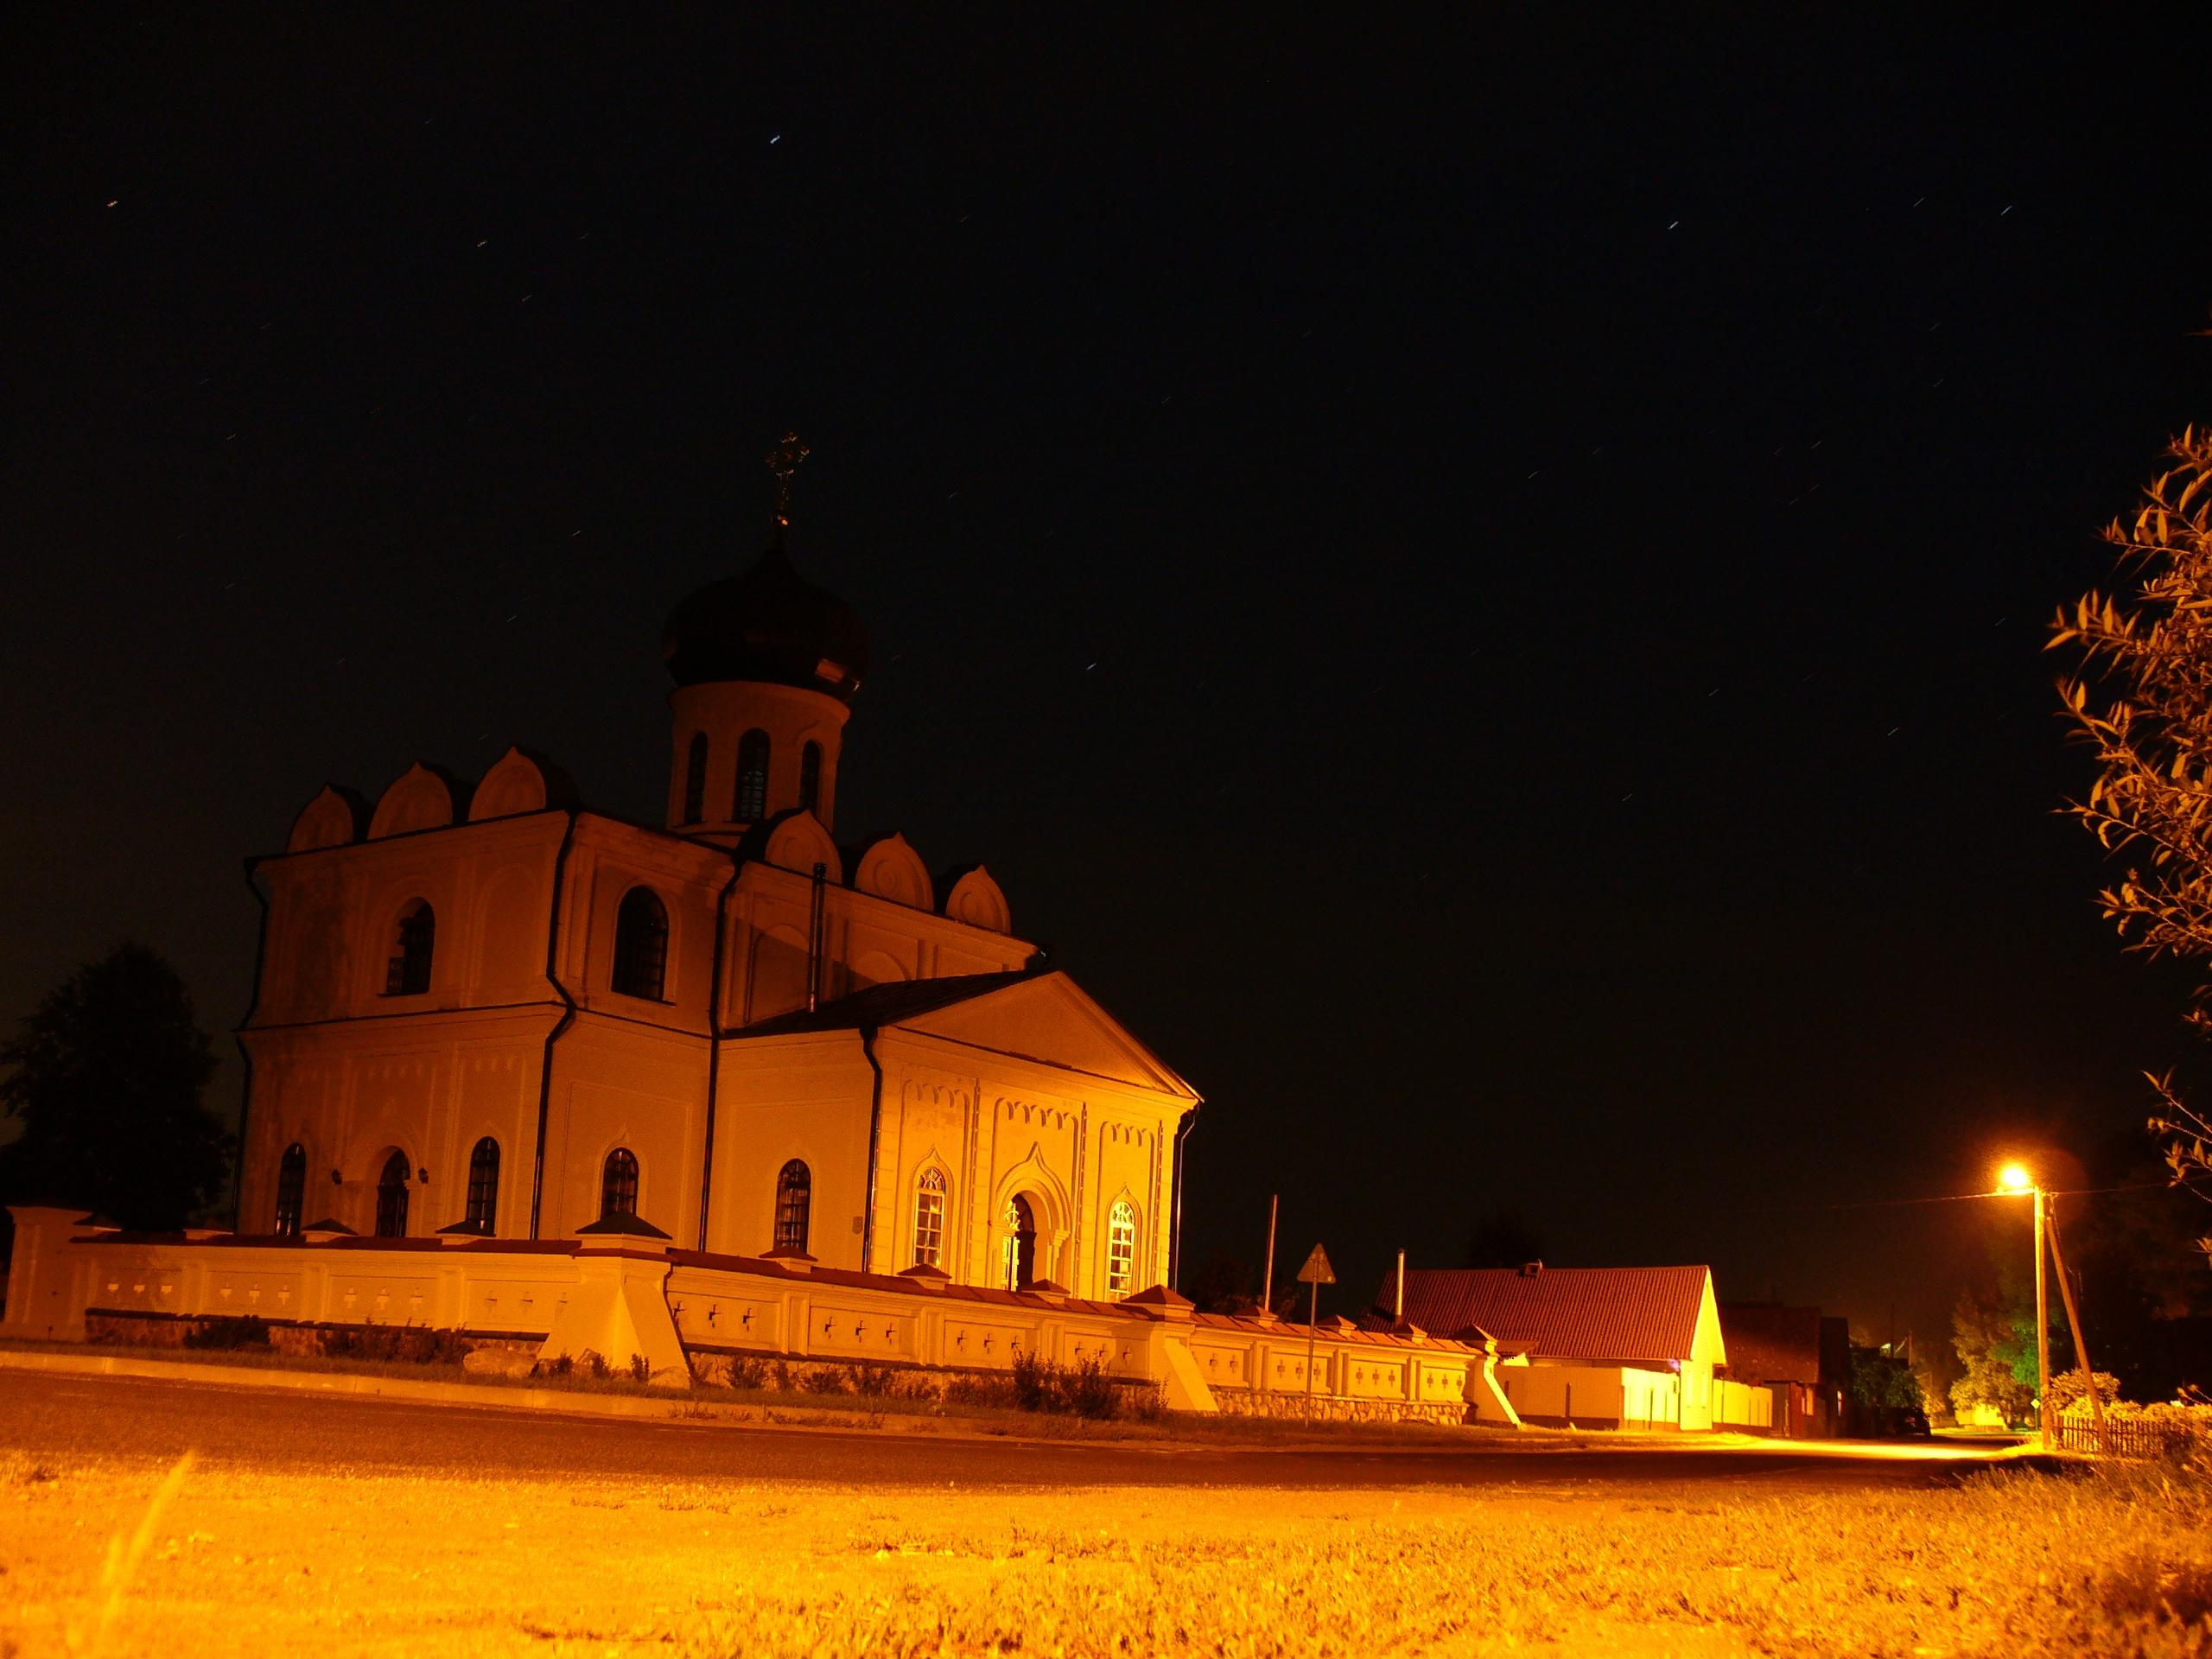 Автор фото: Андрей Иванович. Усадьба Станьково.